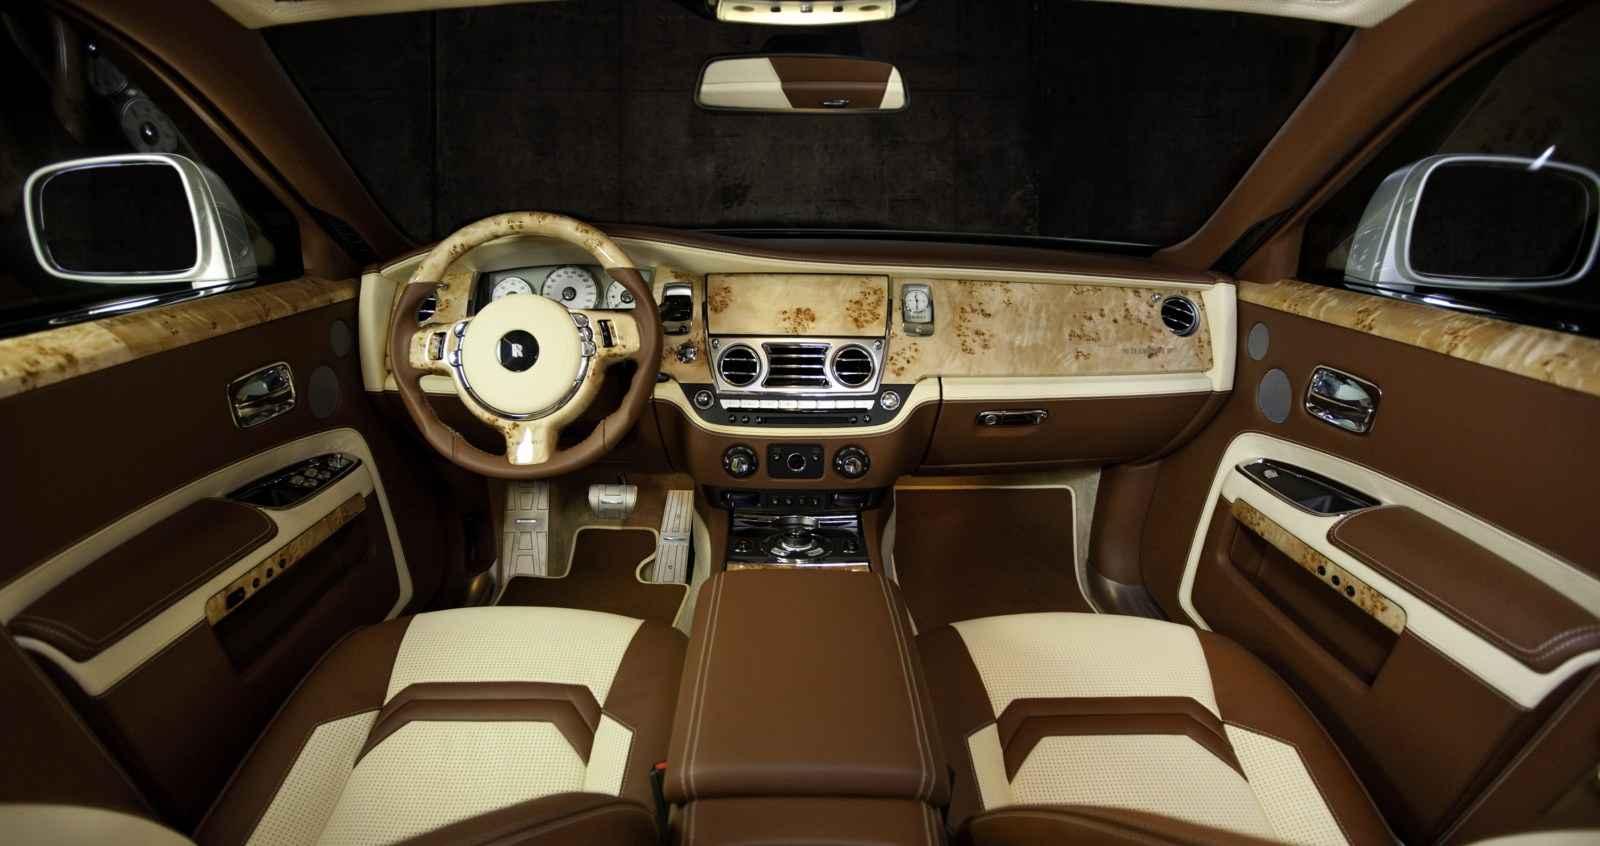 Rolls Royce Ghost Image 6